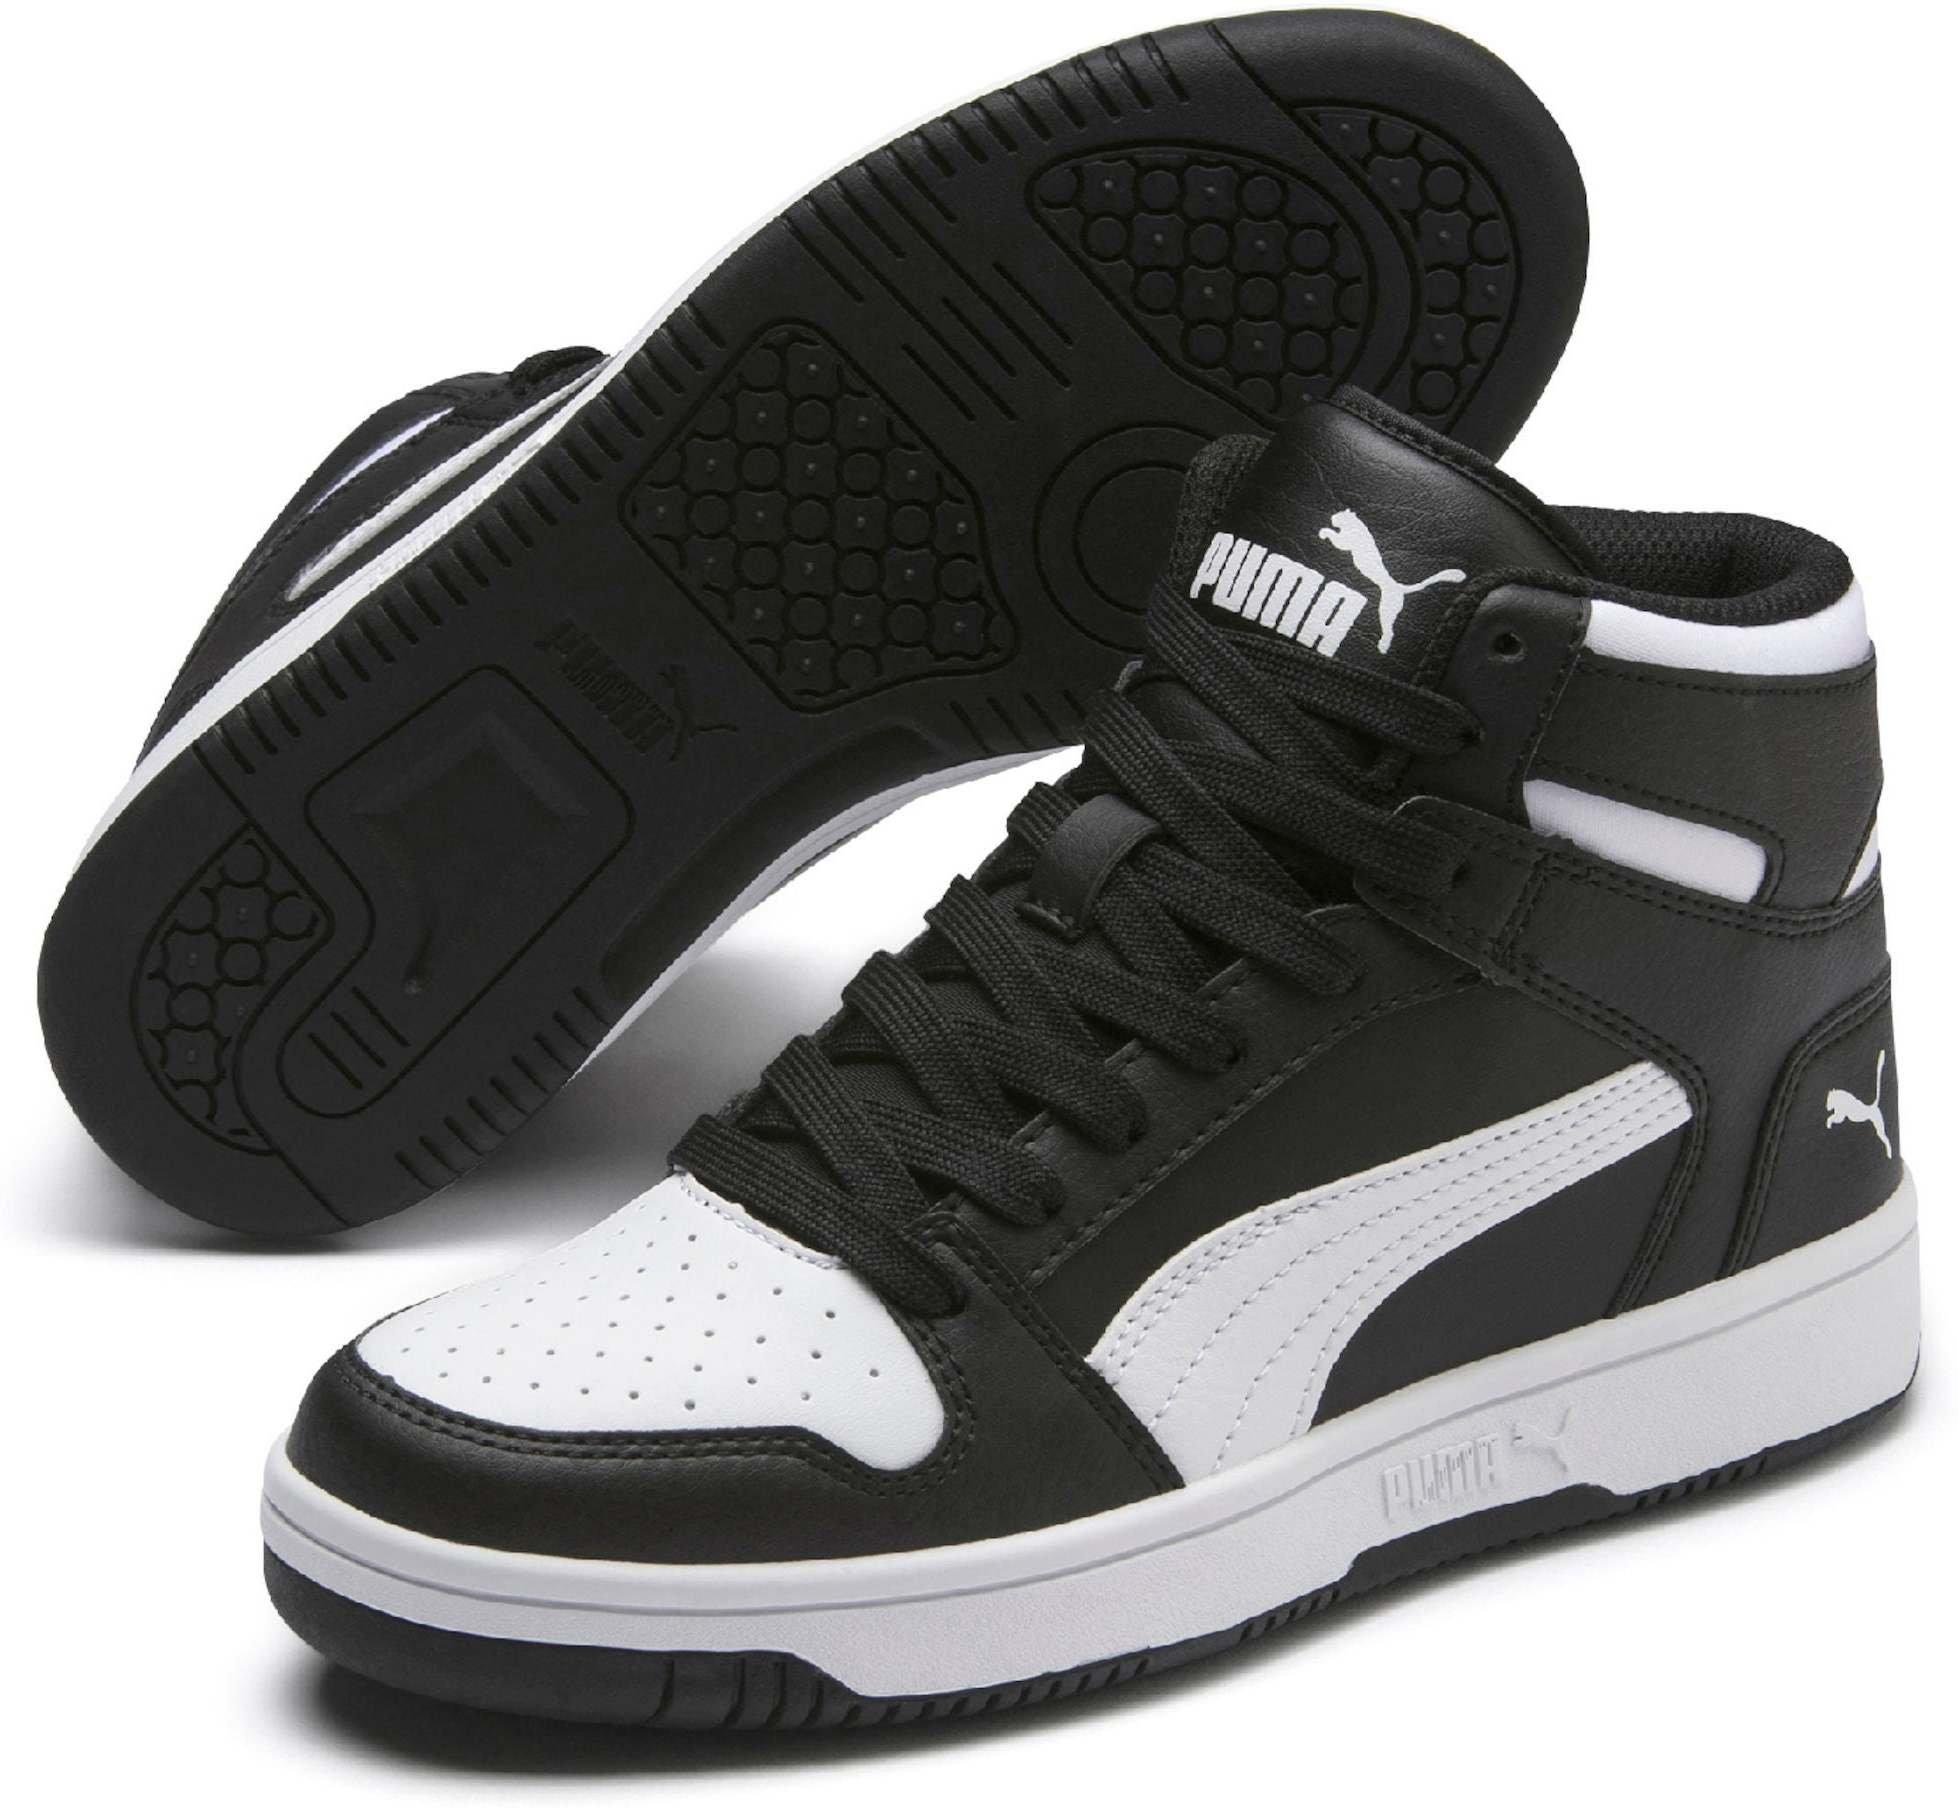 Puma Rebound Layup Sneakers (Barnjunior)